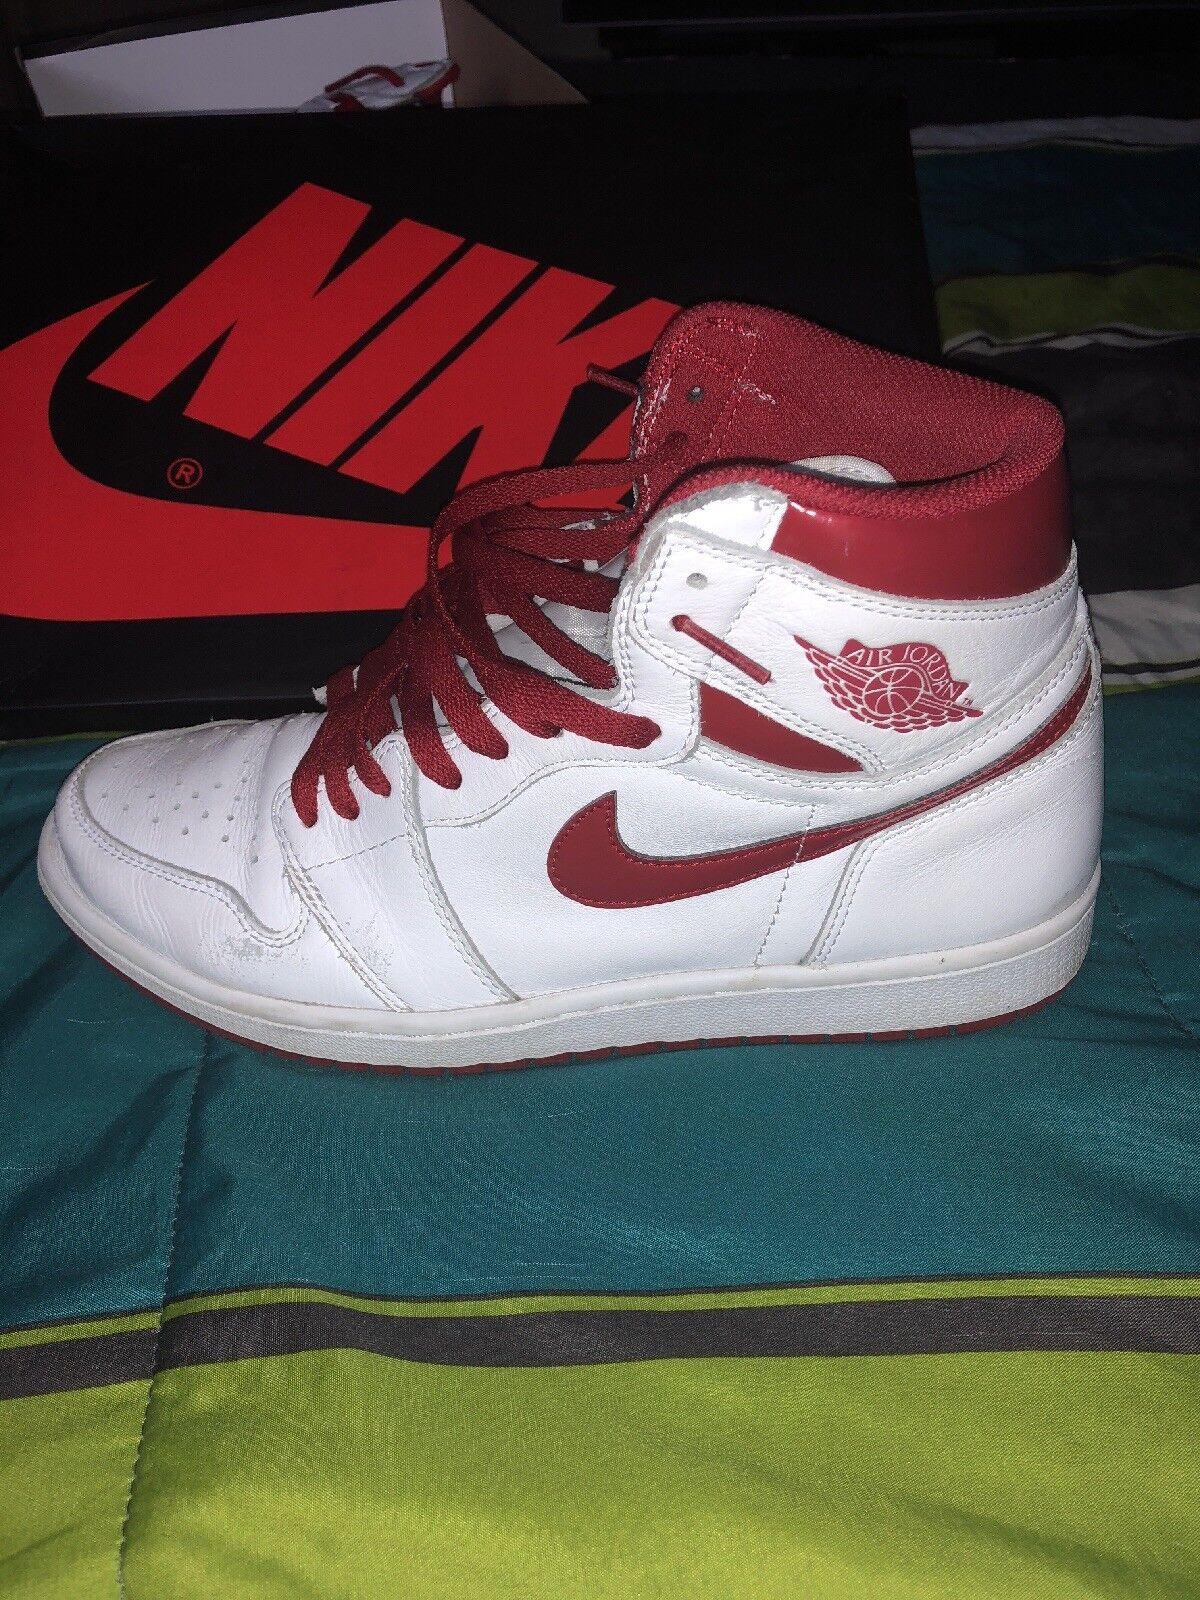 Air Jordan 1 Retro High OG size  I Metallic Red Size 11